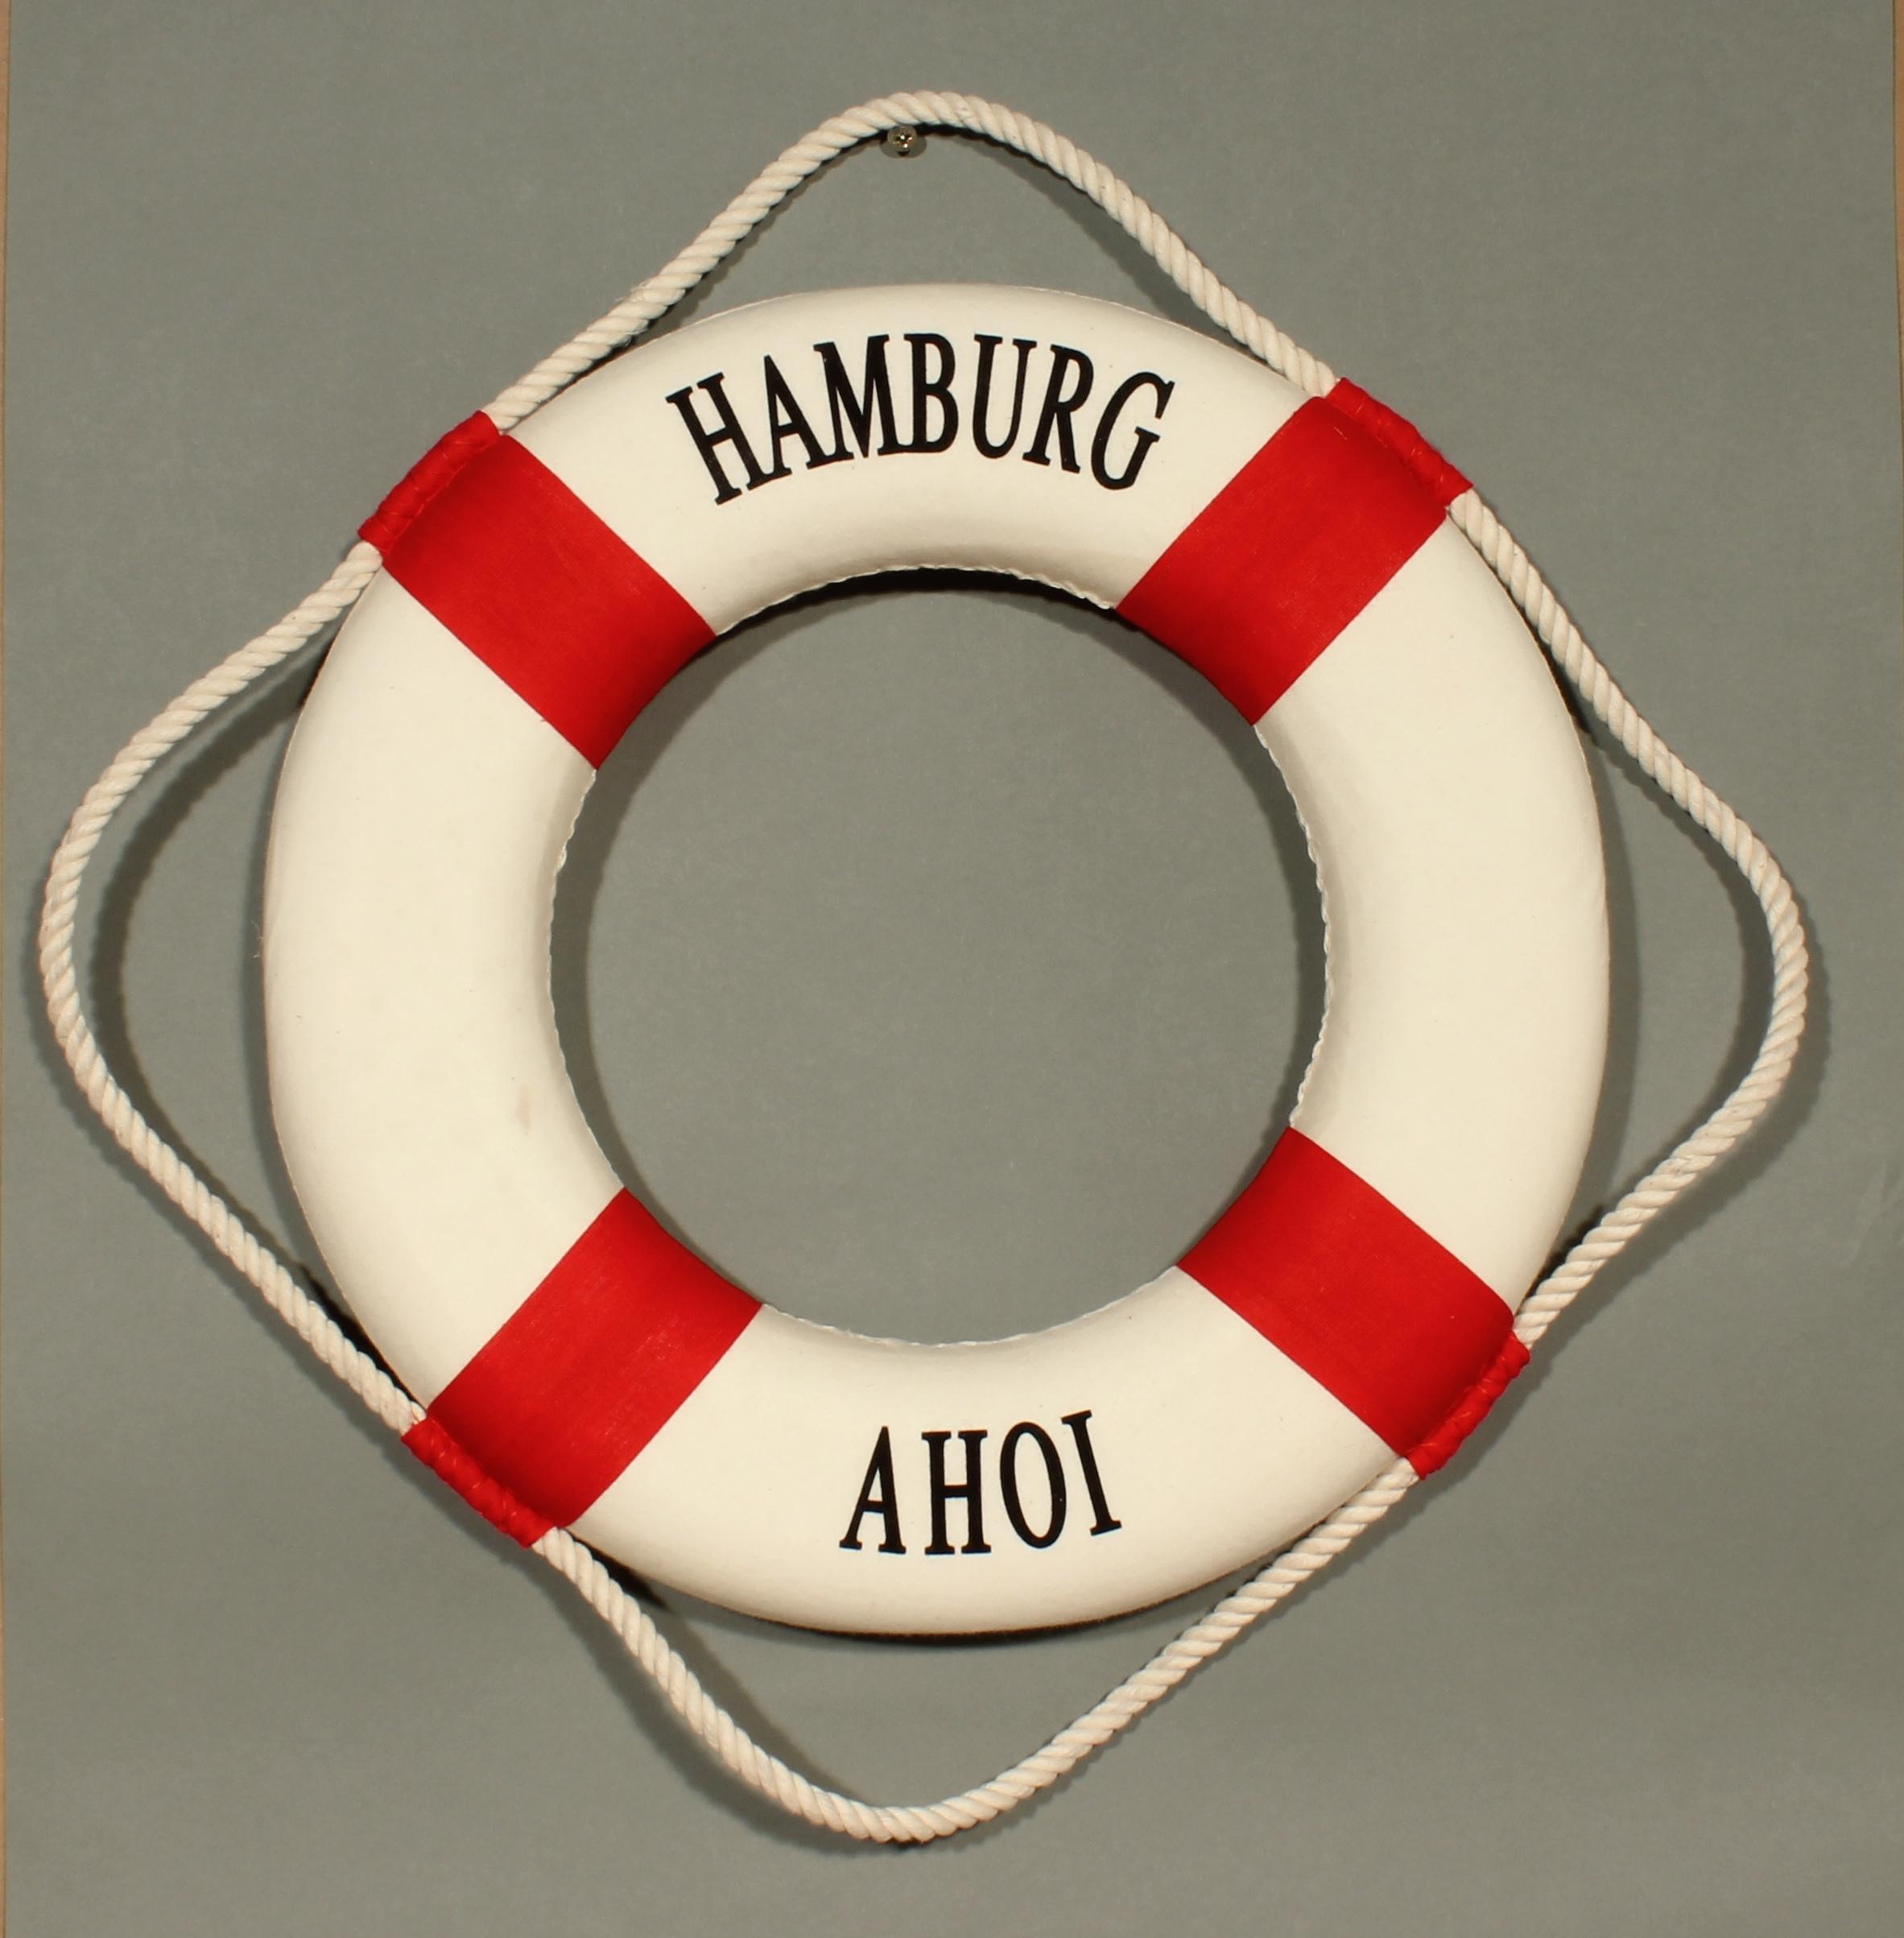 Rettungsring Deko Rot 15cm Hamburg Ahoi Wohnaccessoires